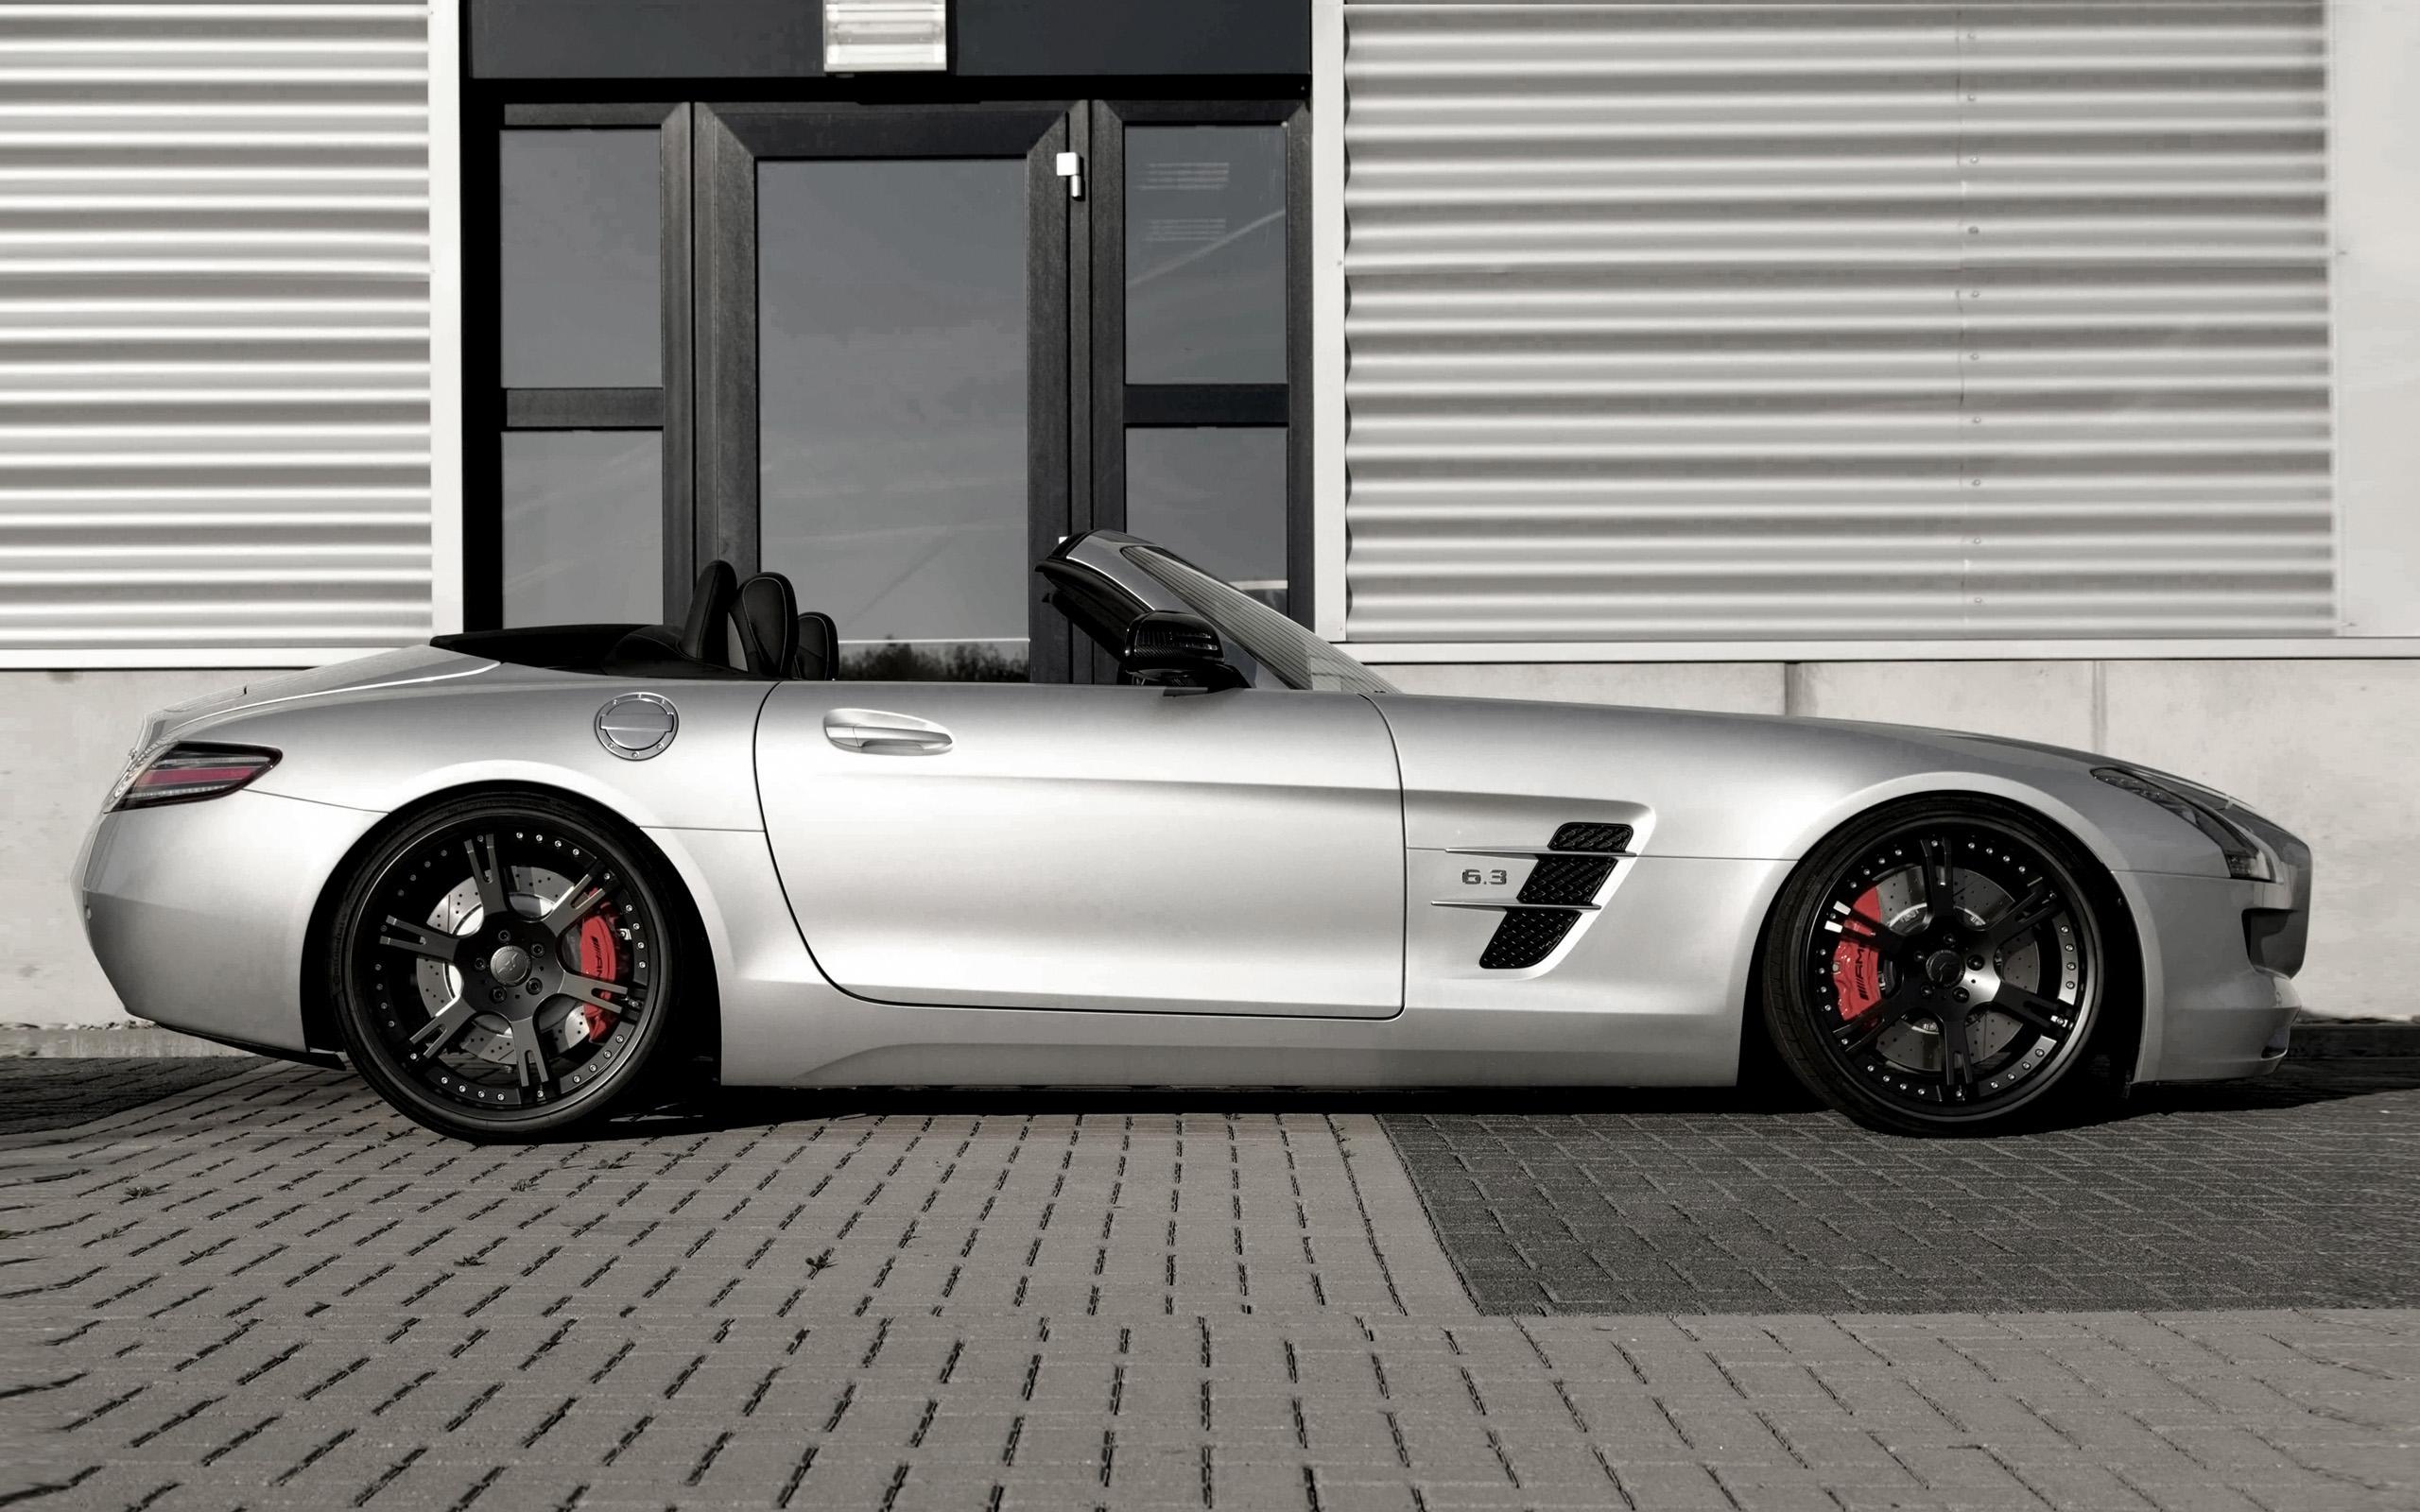 a of insider convertibles business range announced just new mercedes benz